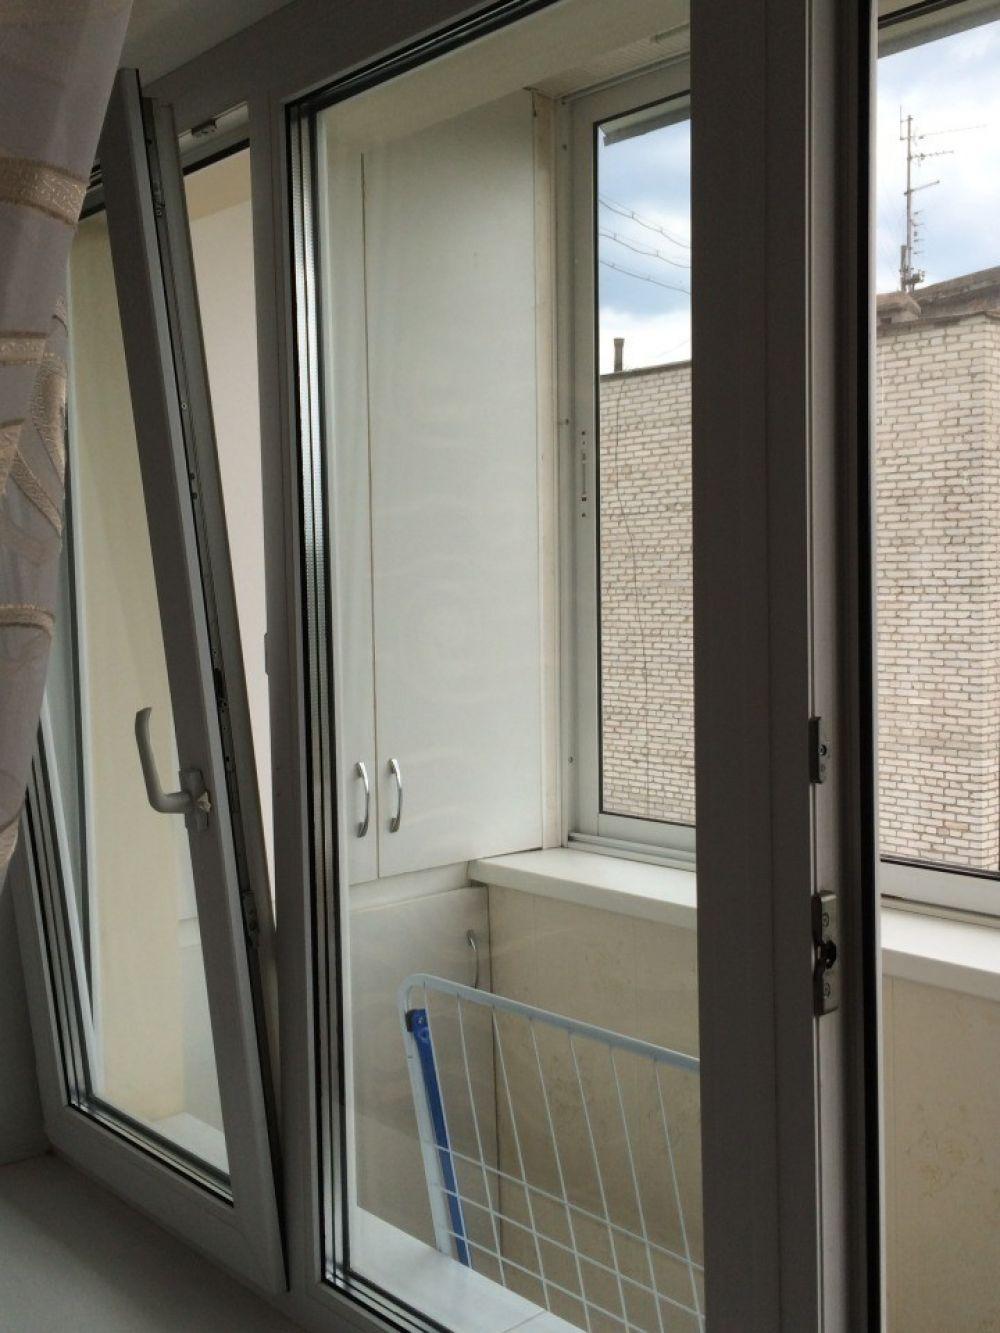 1-комнатная квартира поселок Свердловский ул.Заводская д.1, фото 12